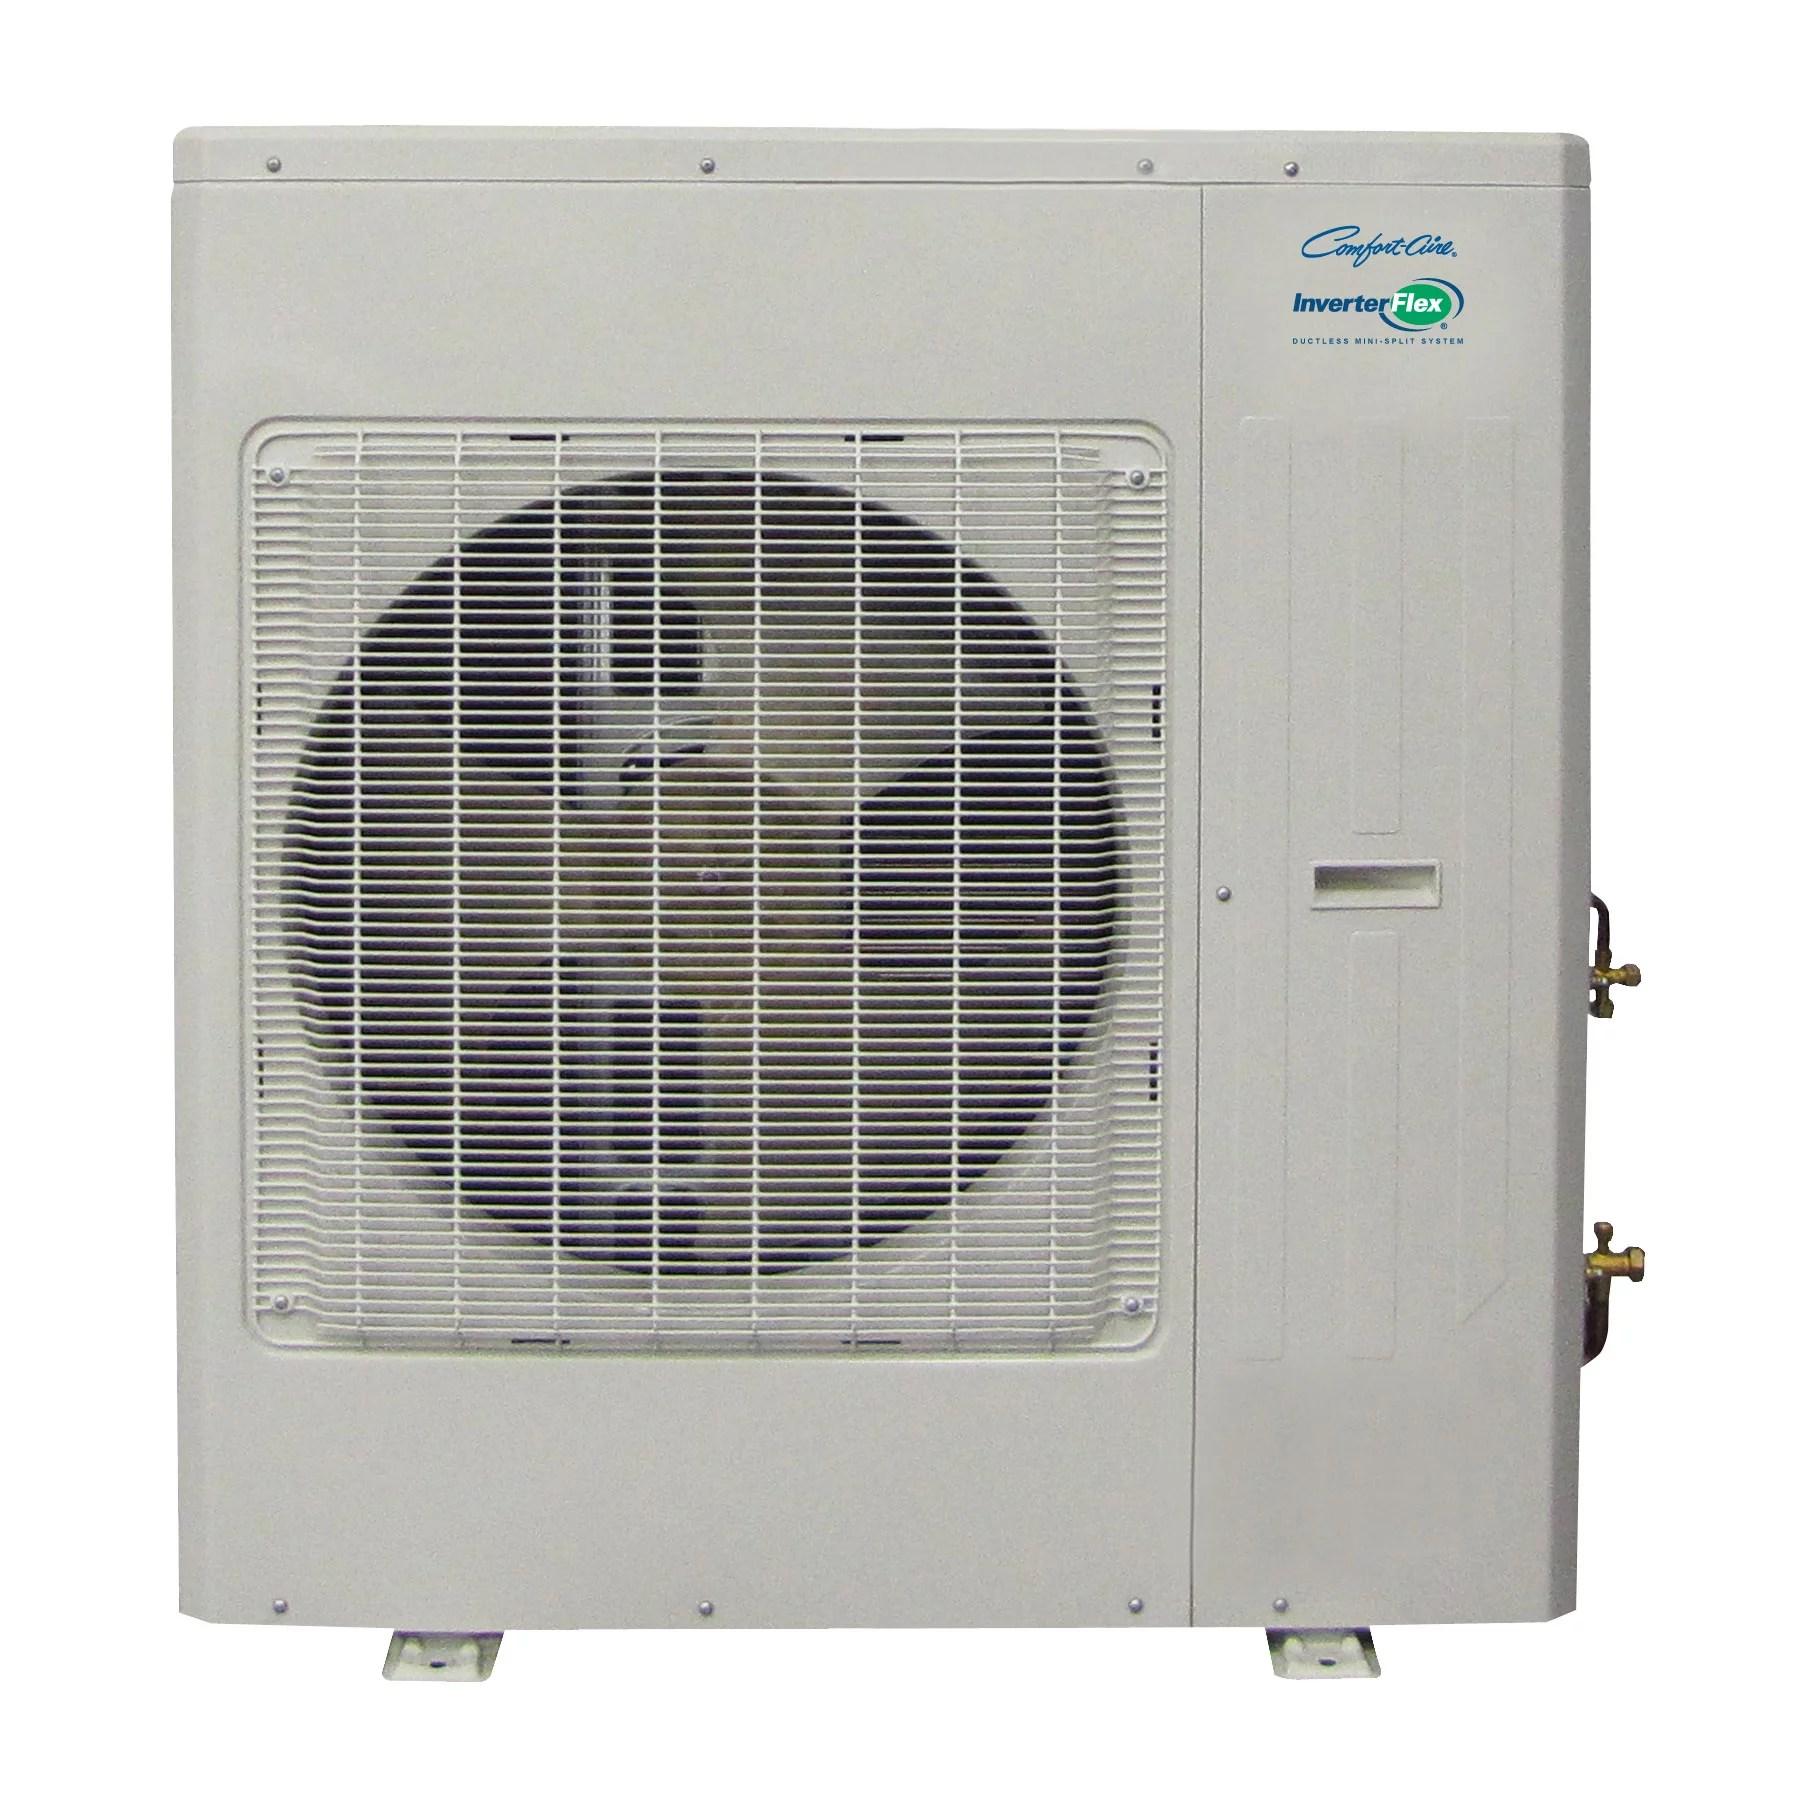 hight resolution of pioneer ductless mini split inverter heat pump system 9 000 btu h 110 120v 17 0 seer walmart com